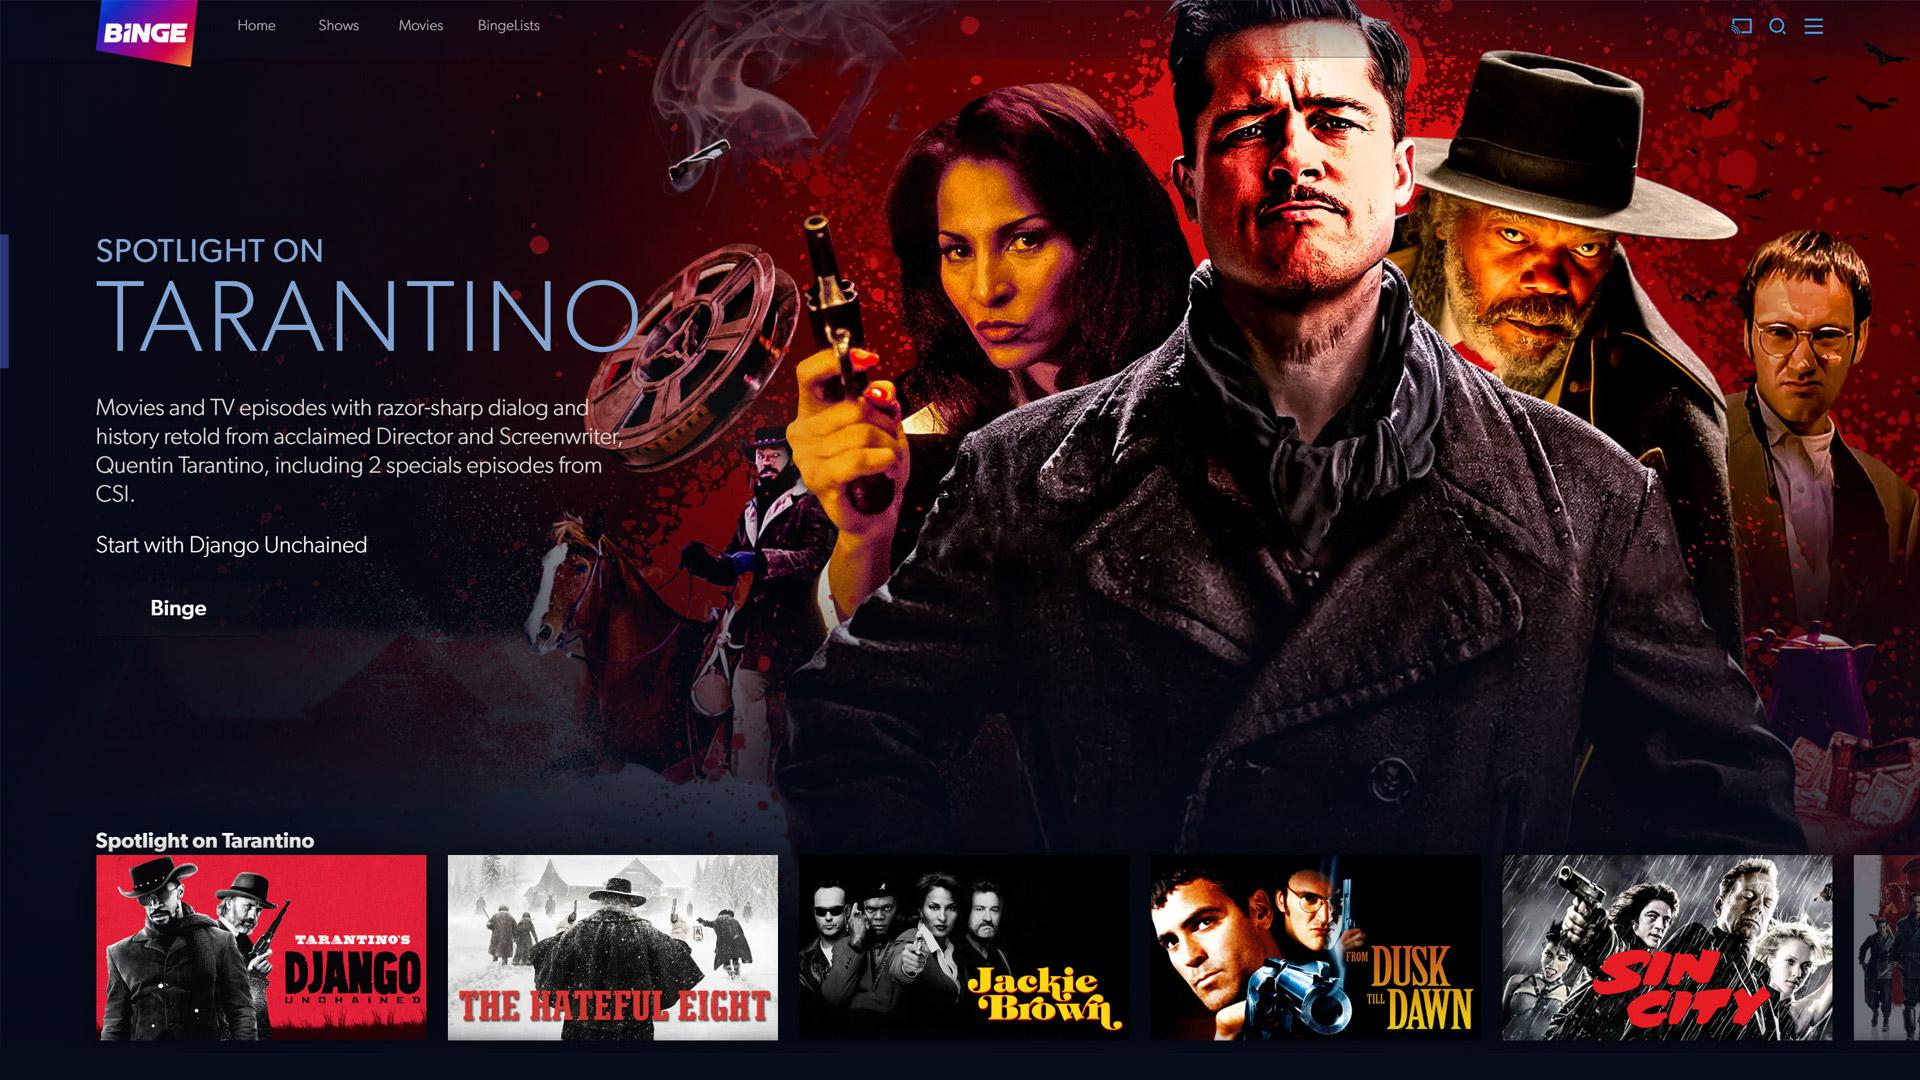 Tarantino on Binge